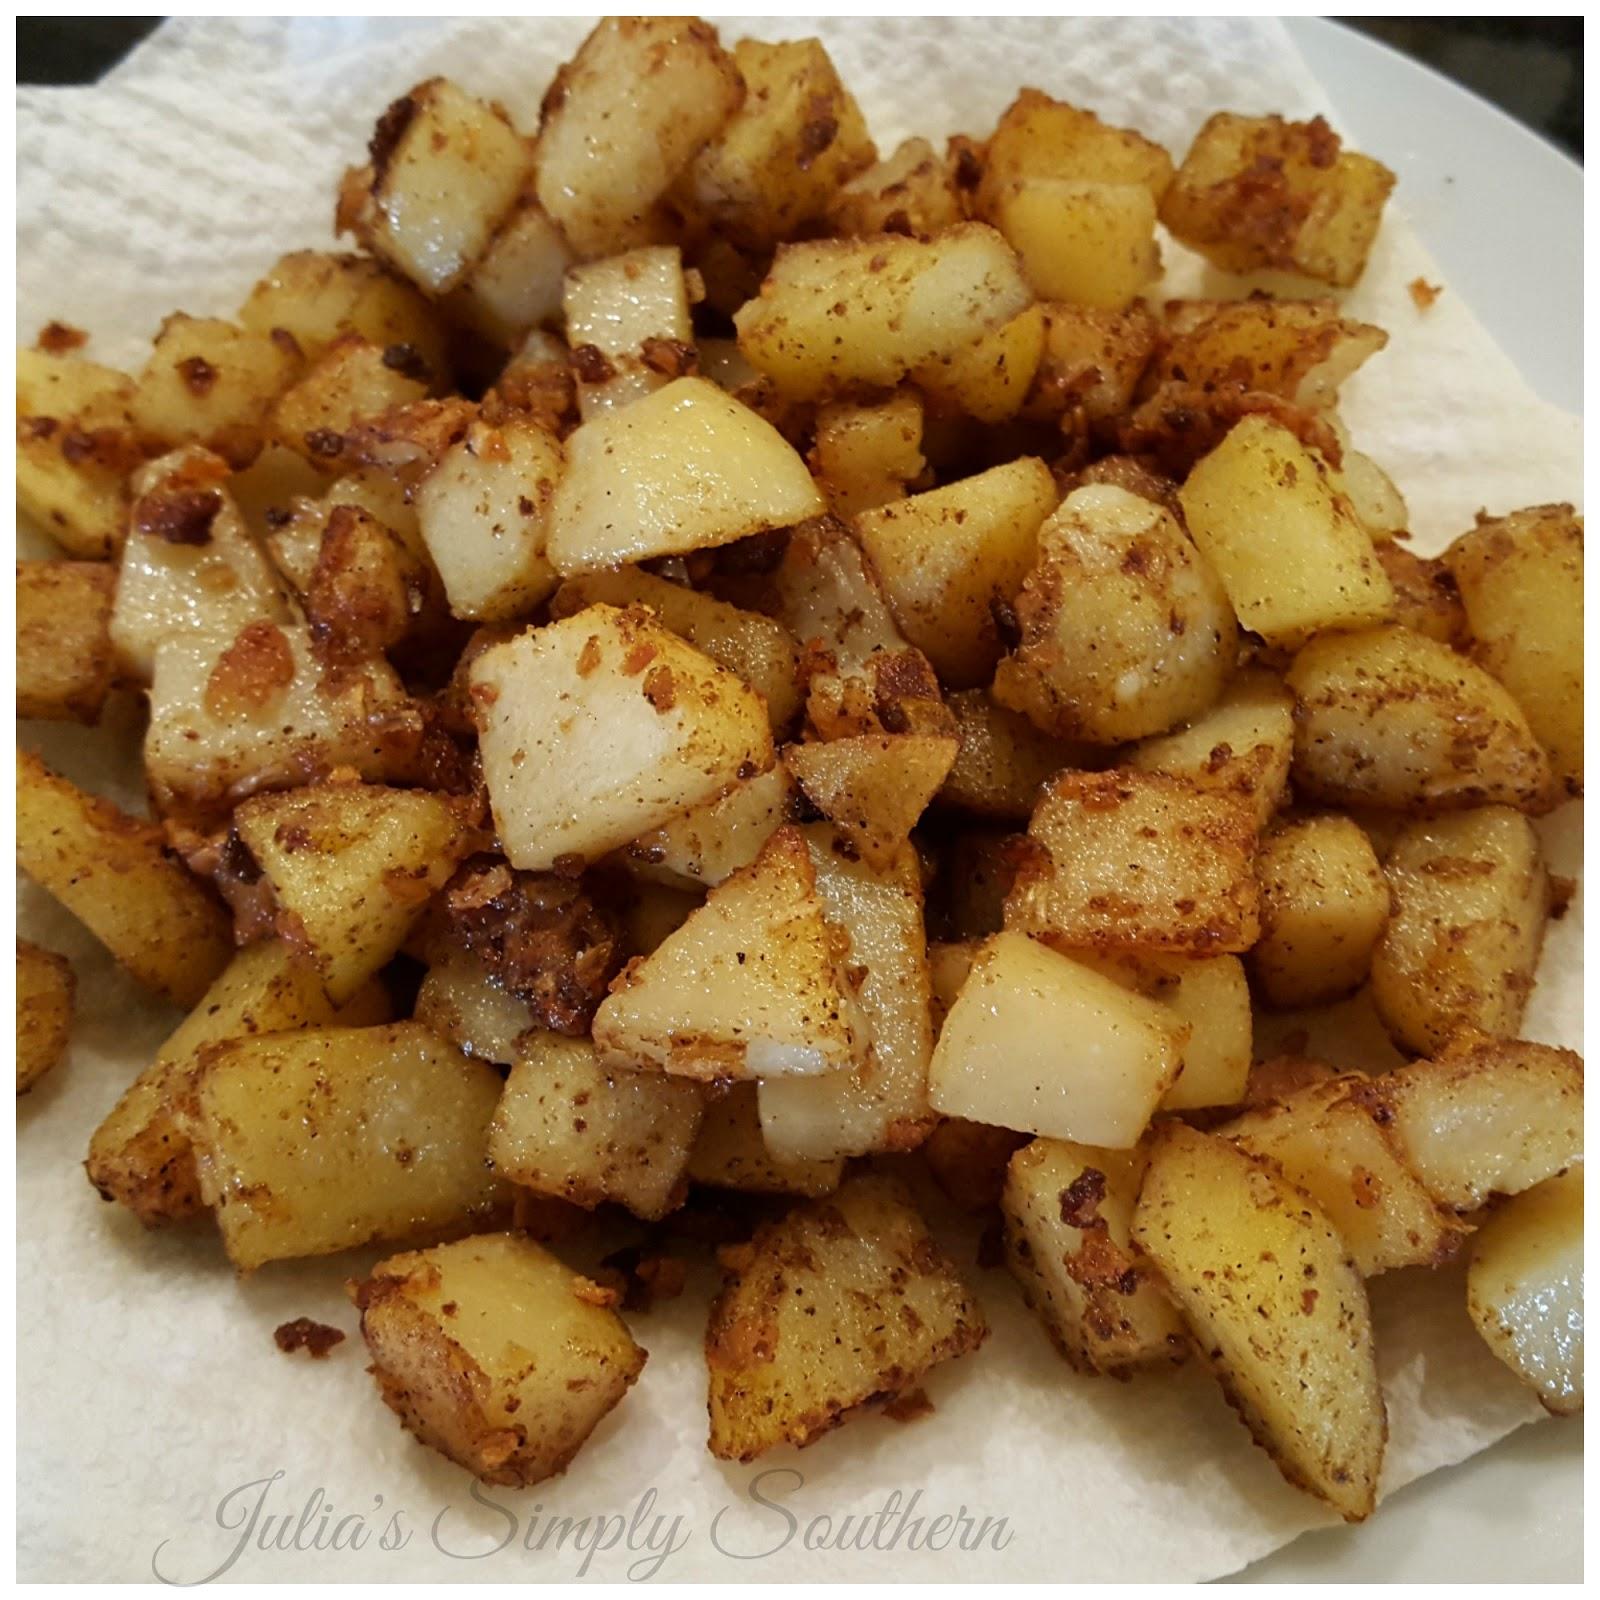 Pan Fried Potatoes Julias Simply Southern